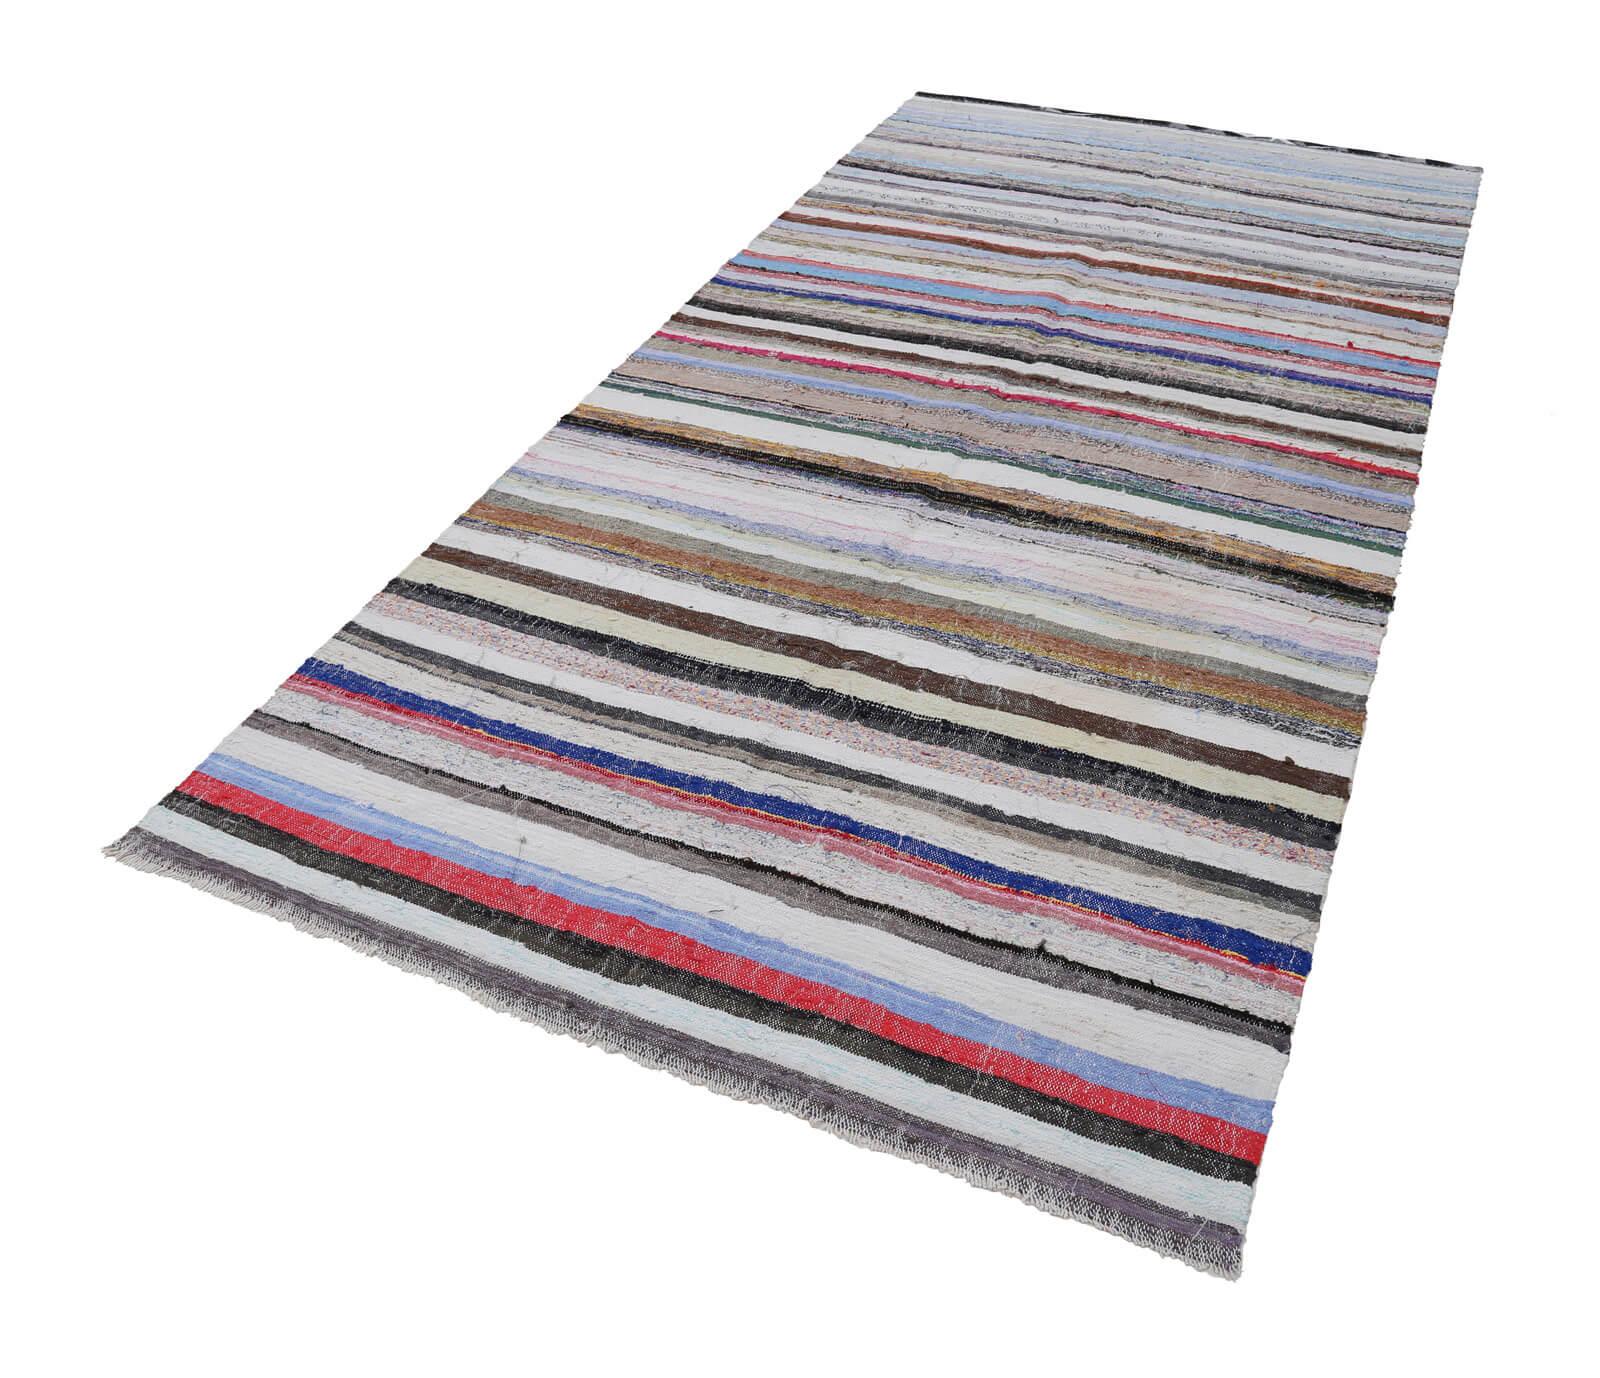 156x319 Cm Beige Handmade Anatolian Rugs Rug-5x10 Ft